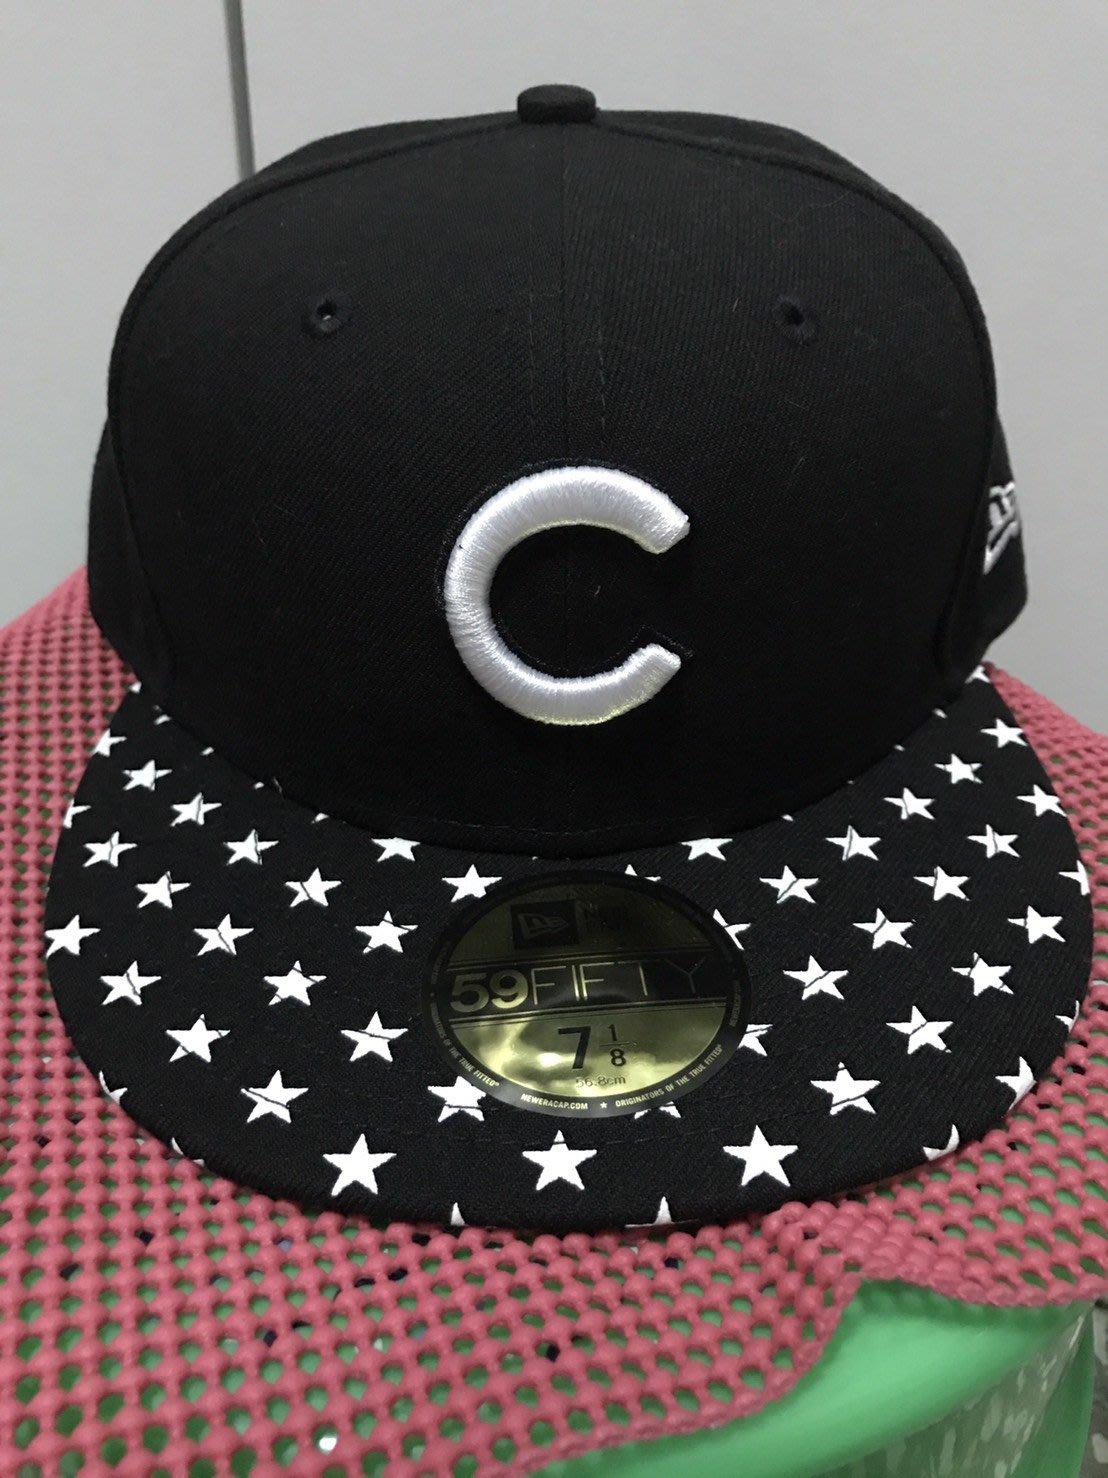 NEW ERA MLB 59FIFTY STARRY CAP CUBS 小熊 棒球帽 正品